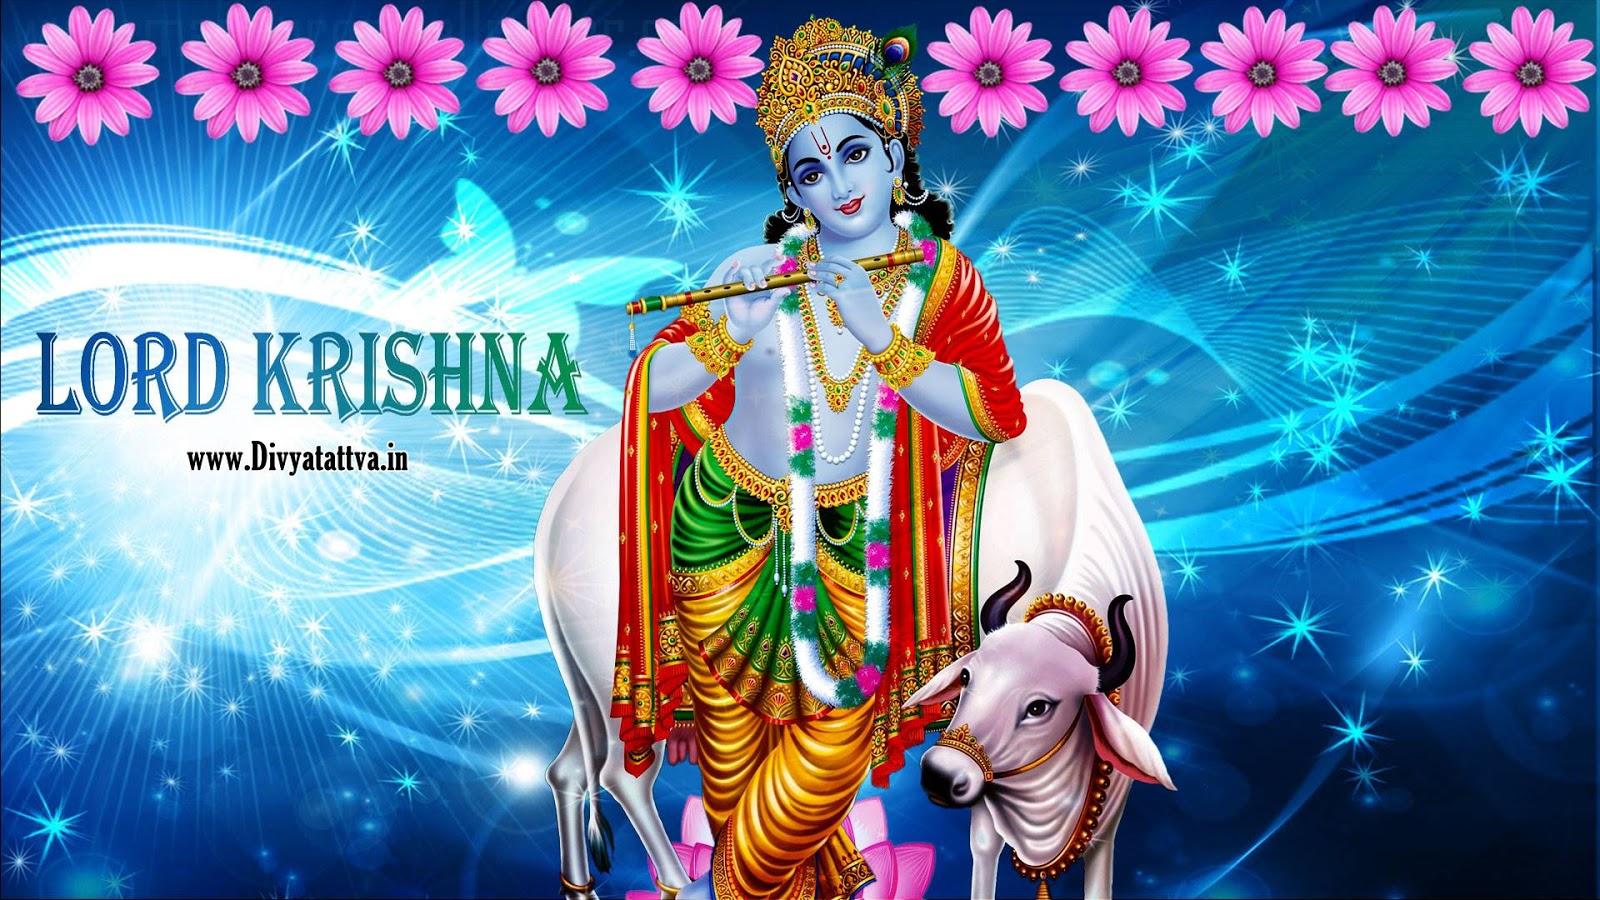 Good Wallpaper Name Divya - jai-shri-krishna-wallpaper-cow-wallpaper-images-backgorunds-graphics-animated-www  Graphic_809567.jpg